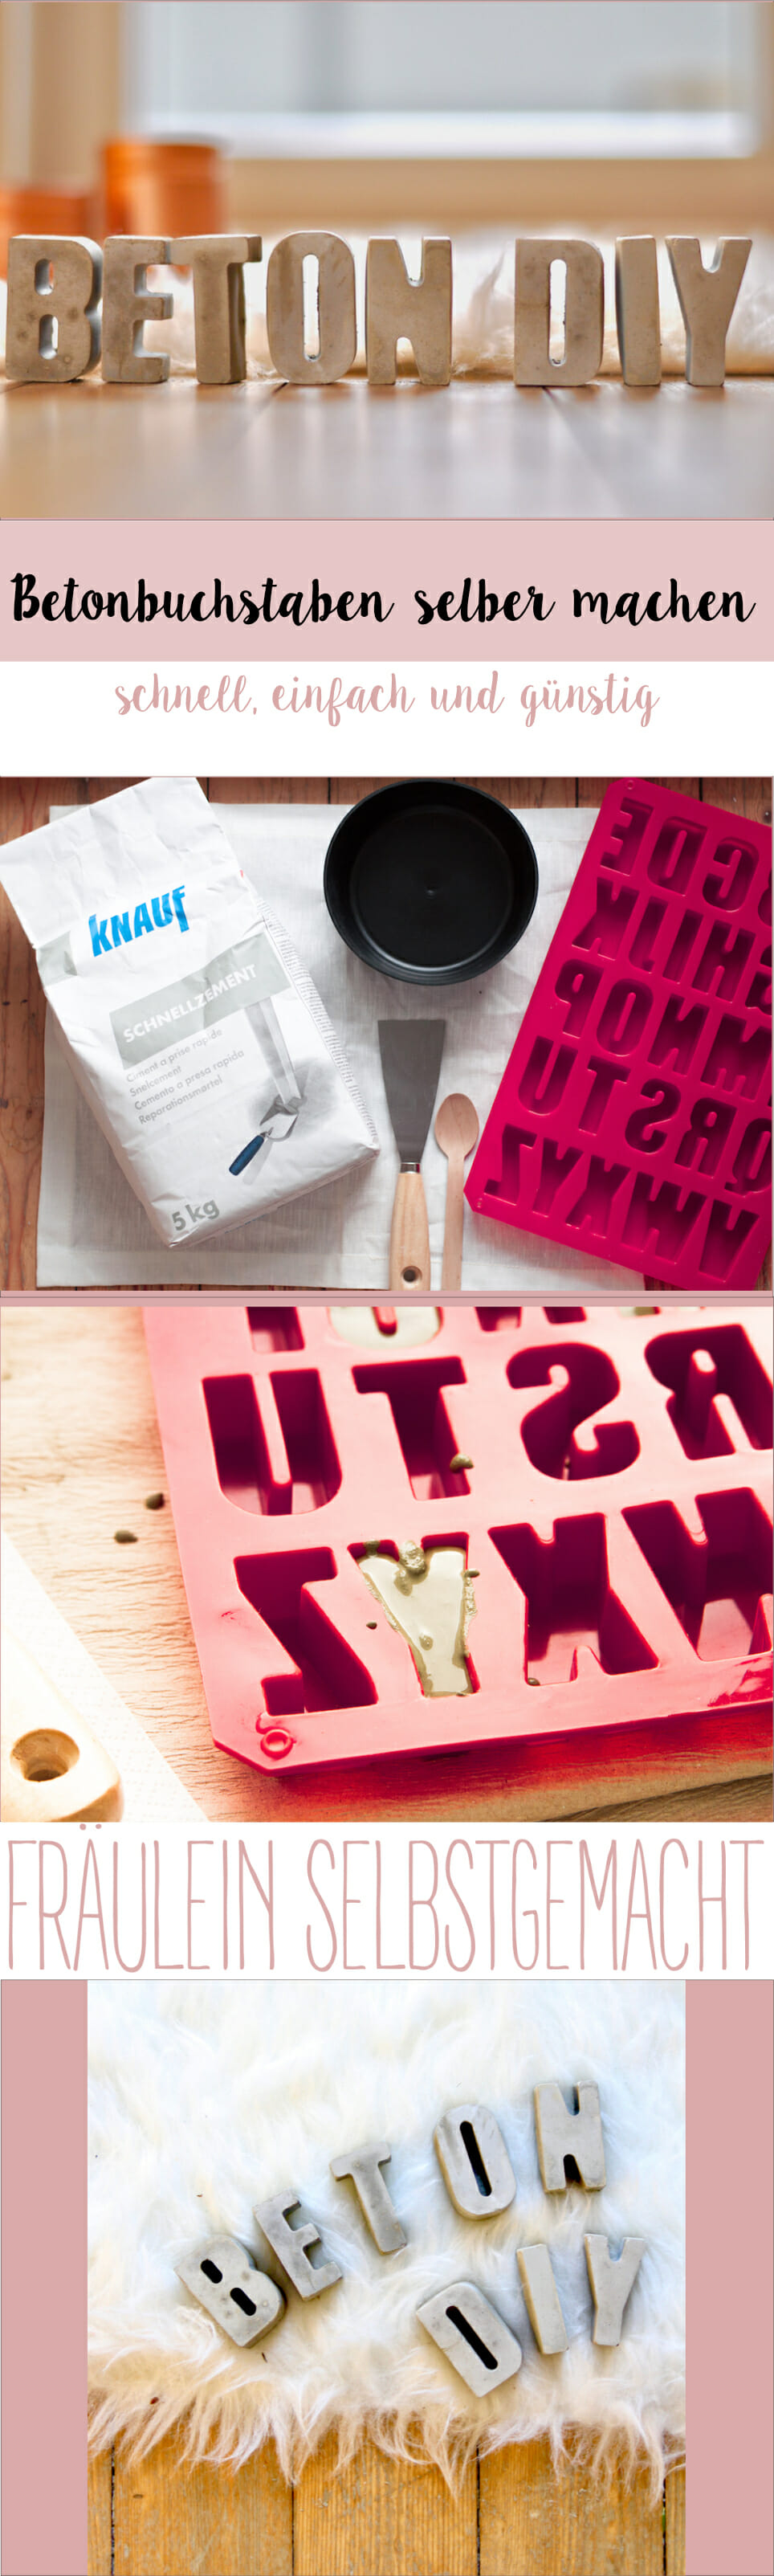 betonbuchstaben-pinterest